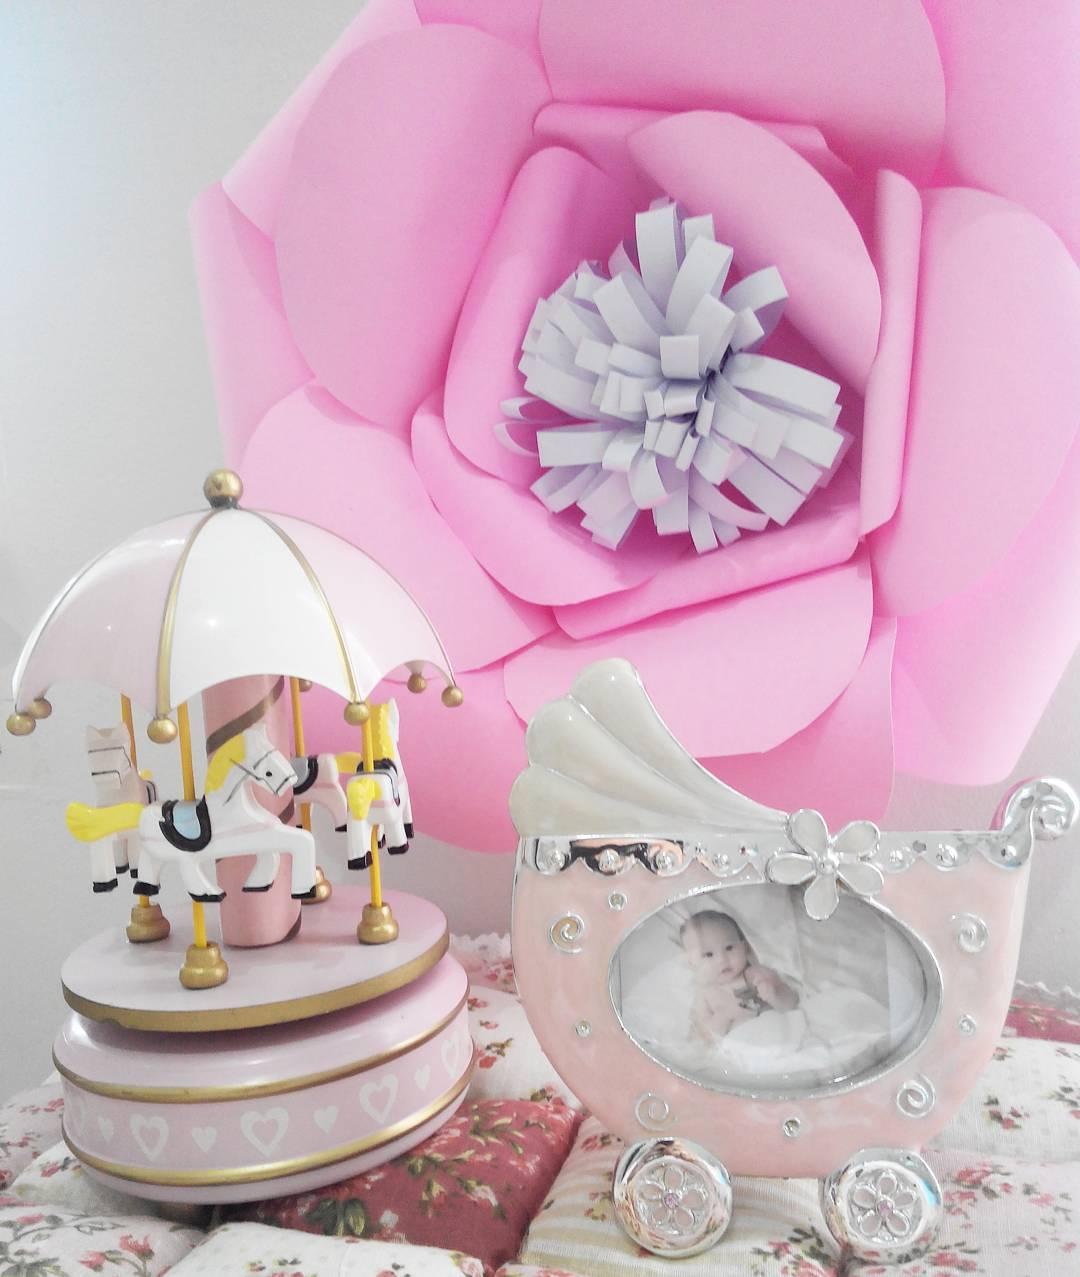 Ide dan cara membuat hiasan dinding berbentuk bunga dari kertas hiasan bunga untuk pajangan ruang tamu thecheapjerseys Images